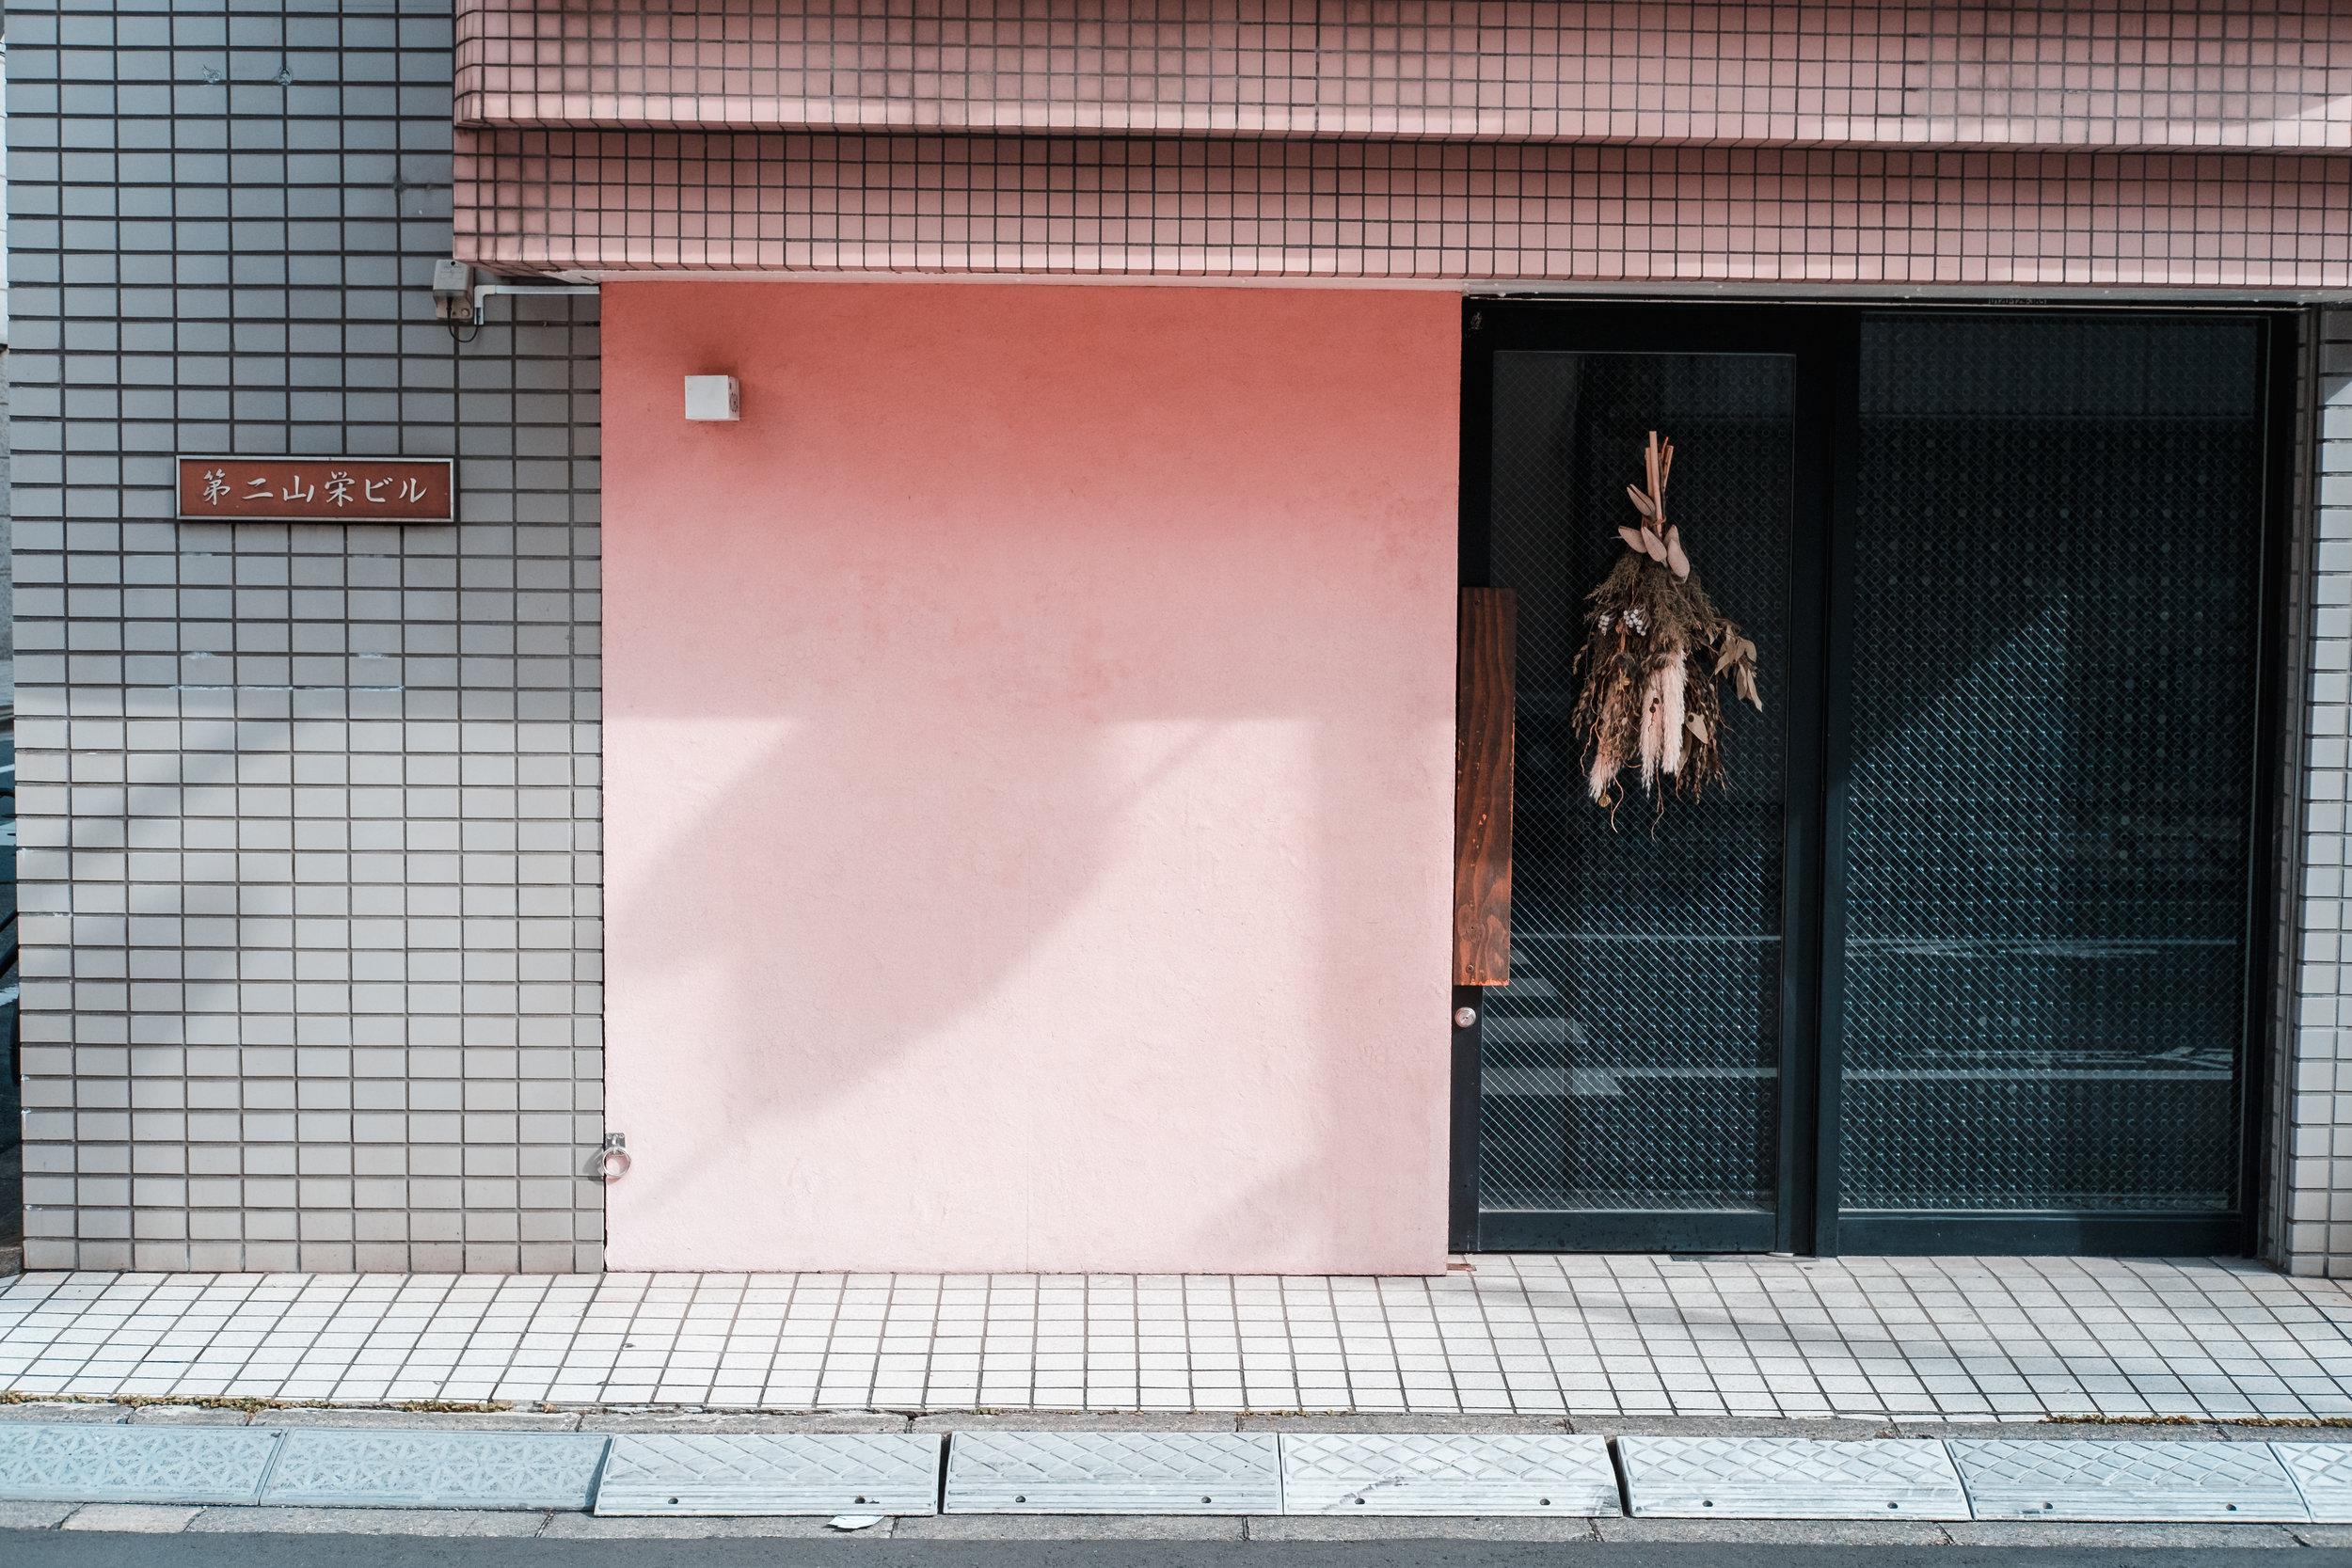 Tokyo_Nov_2018_AdamDillon_DSCF1122.jpg